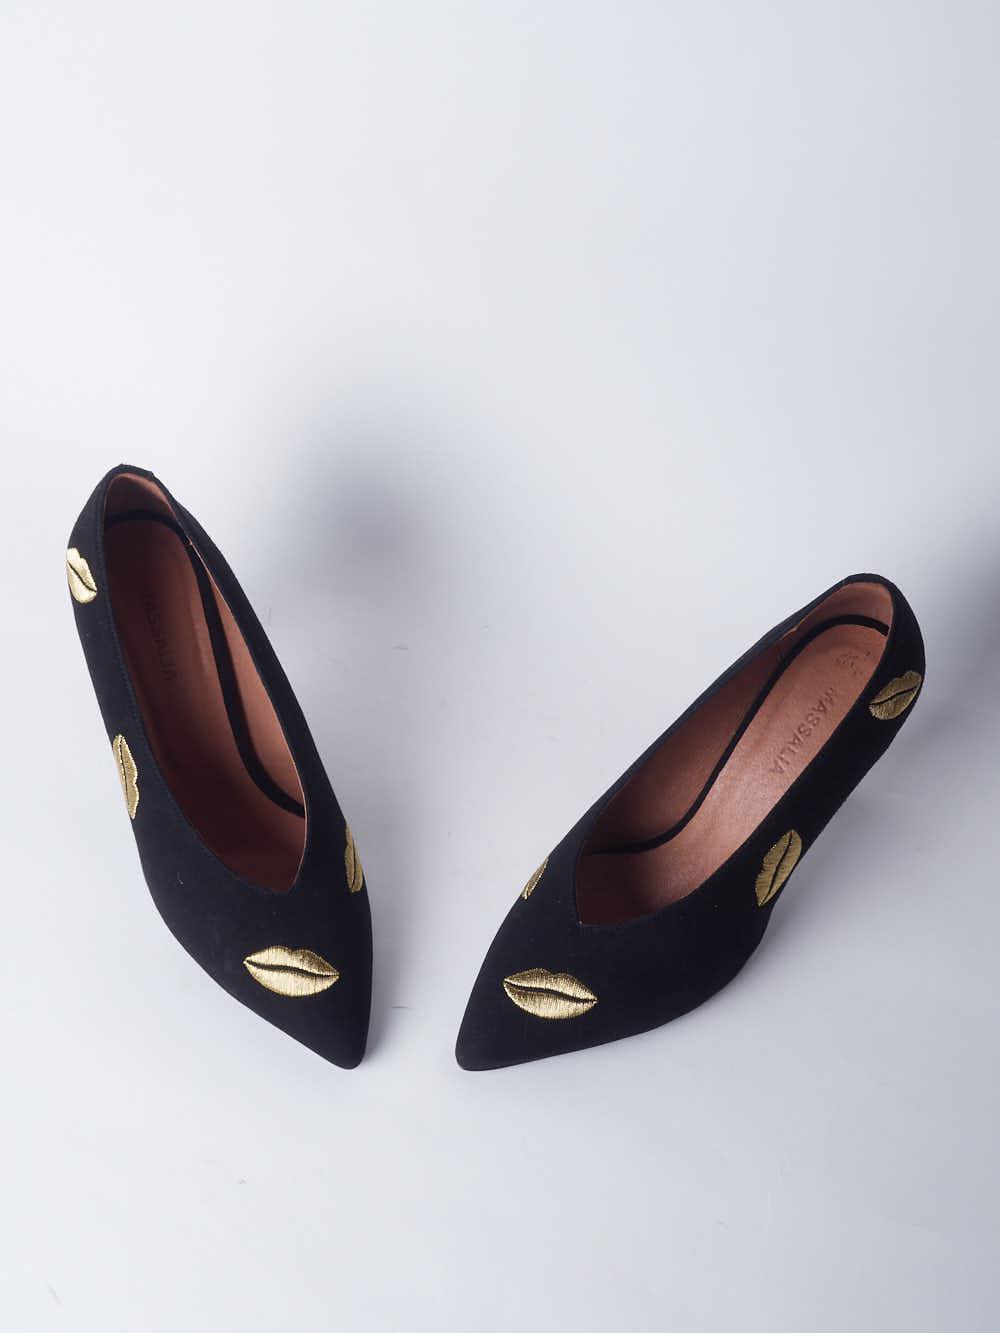 CHARONE-LIPSTICK-escarpin-velours-noir-fil-or-collection-AW1920-Kmassalia-